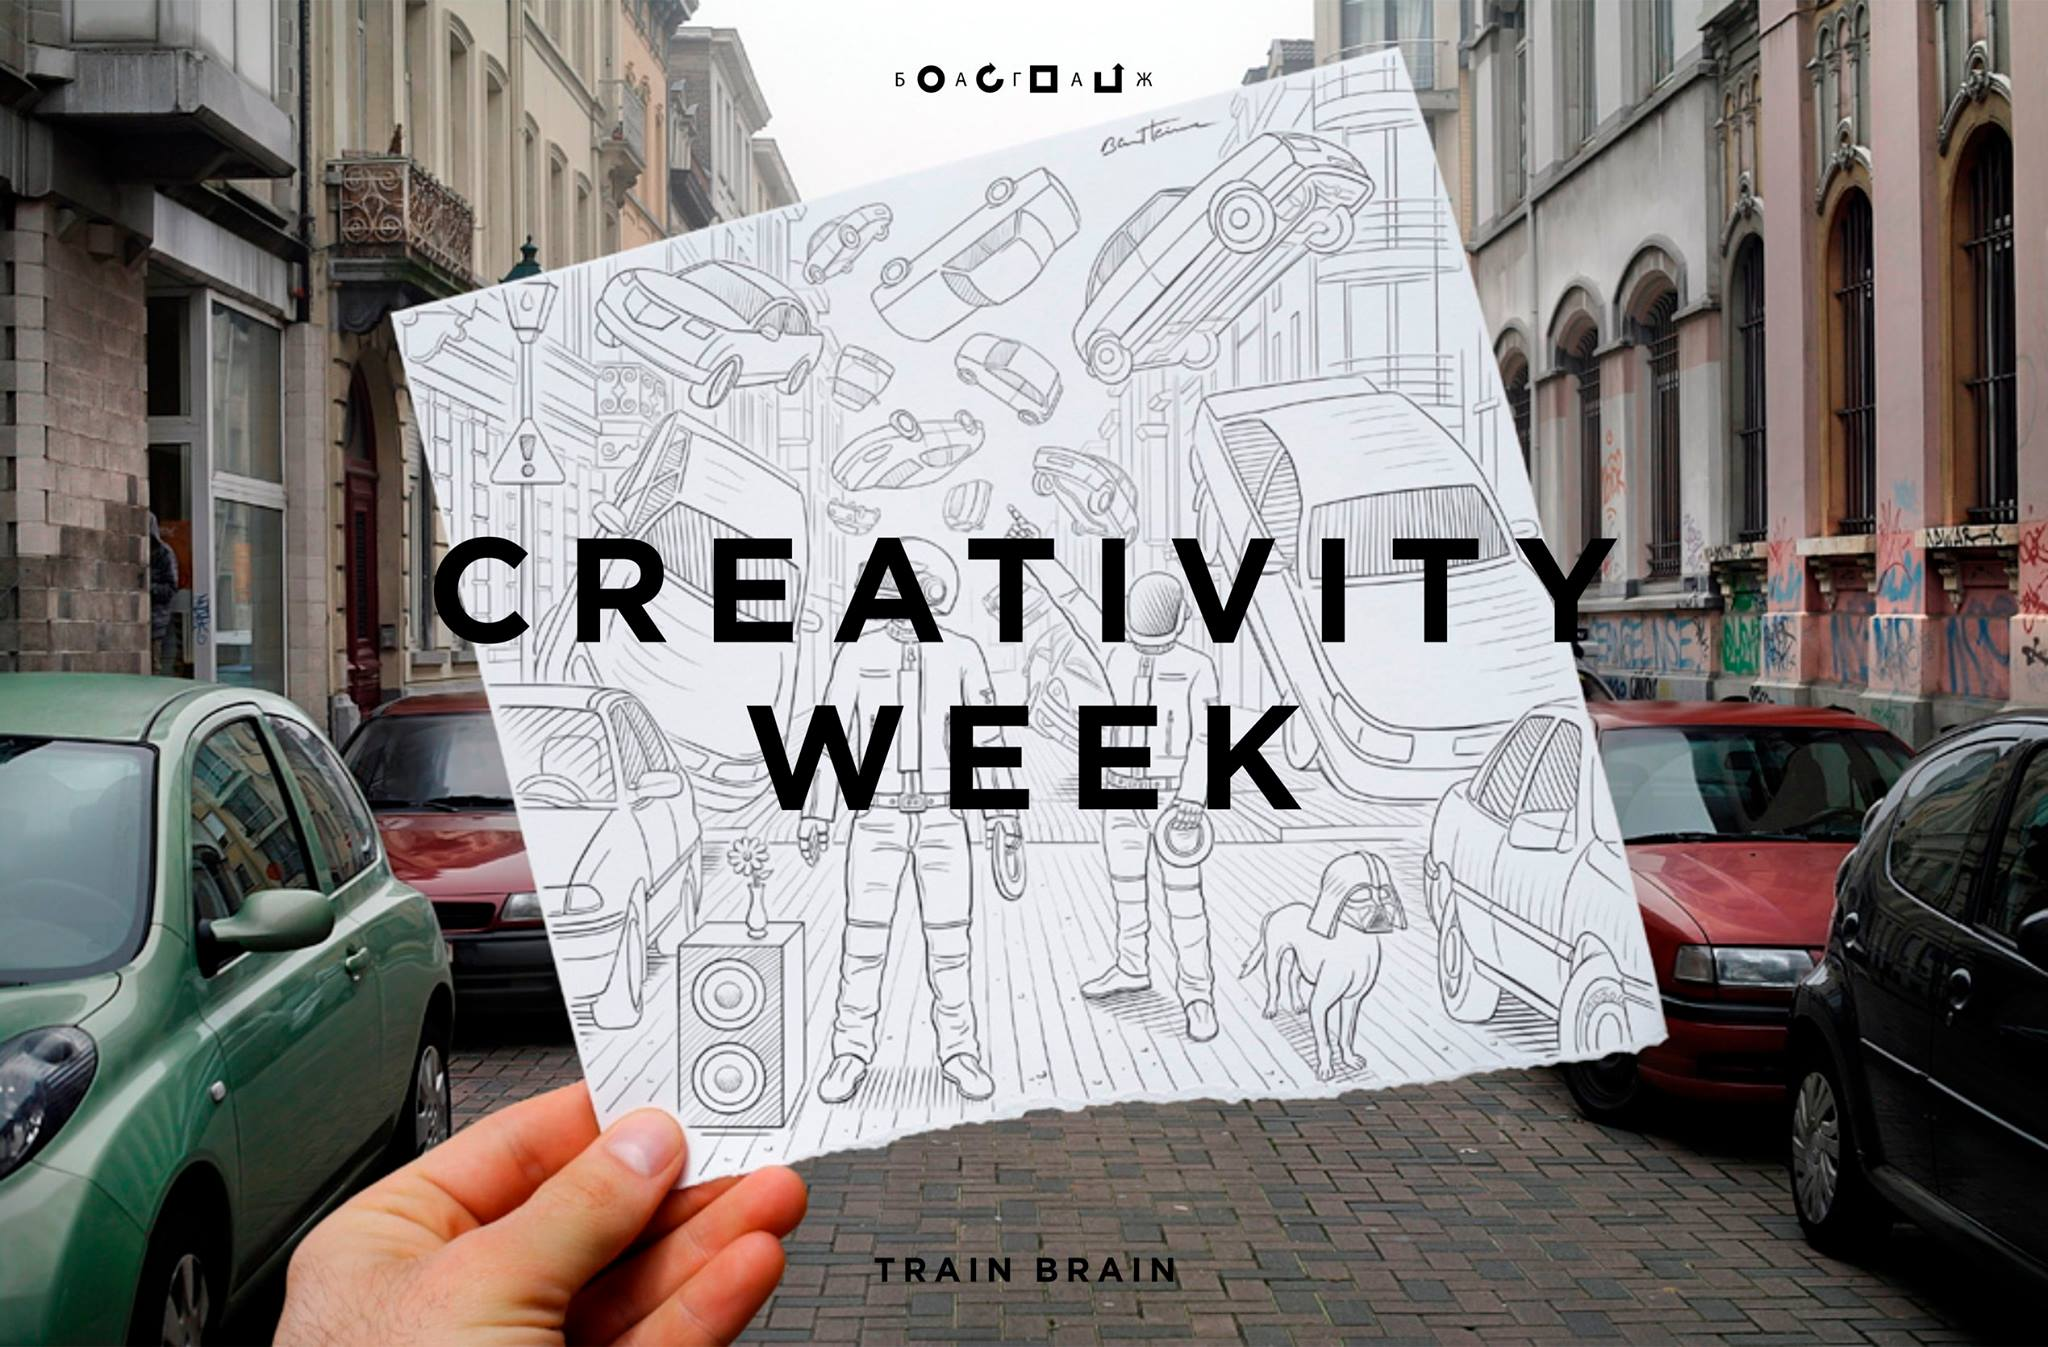 22_january_2017_CREATIVITY WEEK